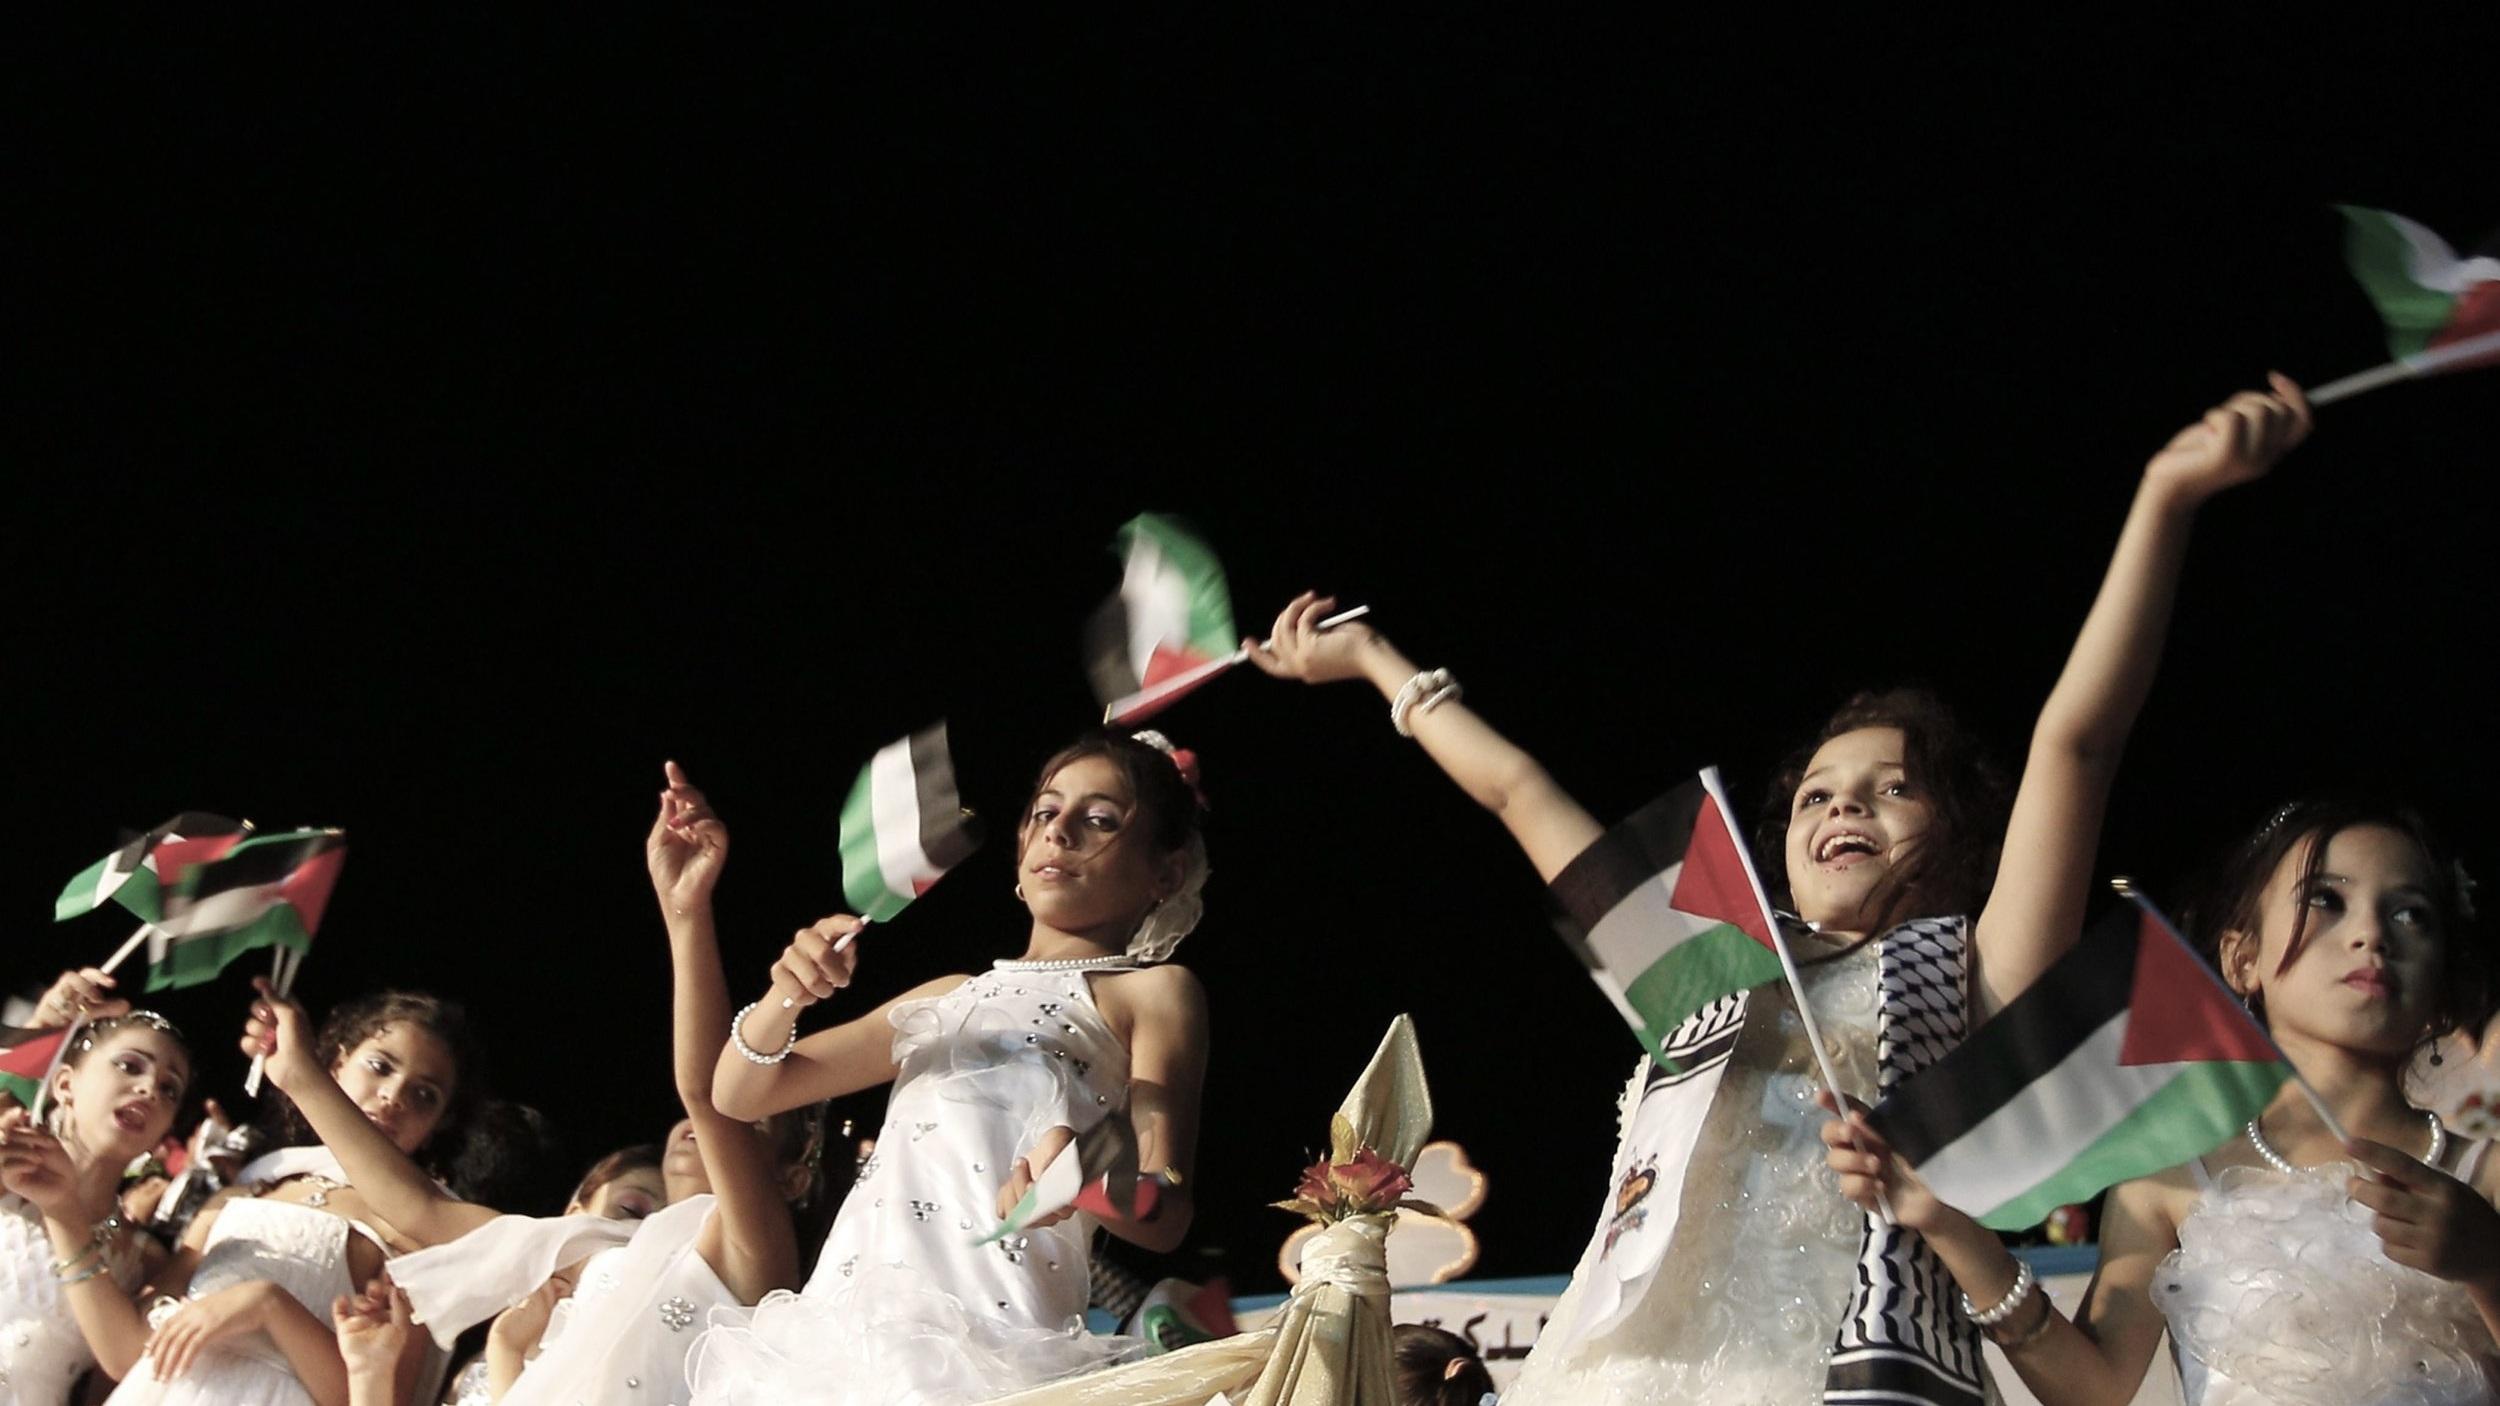 WEDDING BELLS IN GAZA. CREDIT: MOHAMMED SABER/EPA/SHUTTERSTOCK